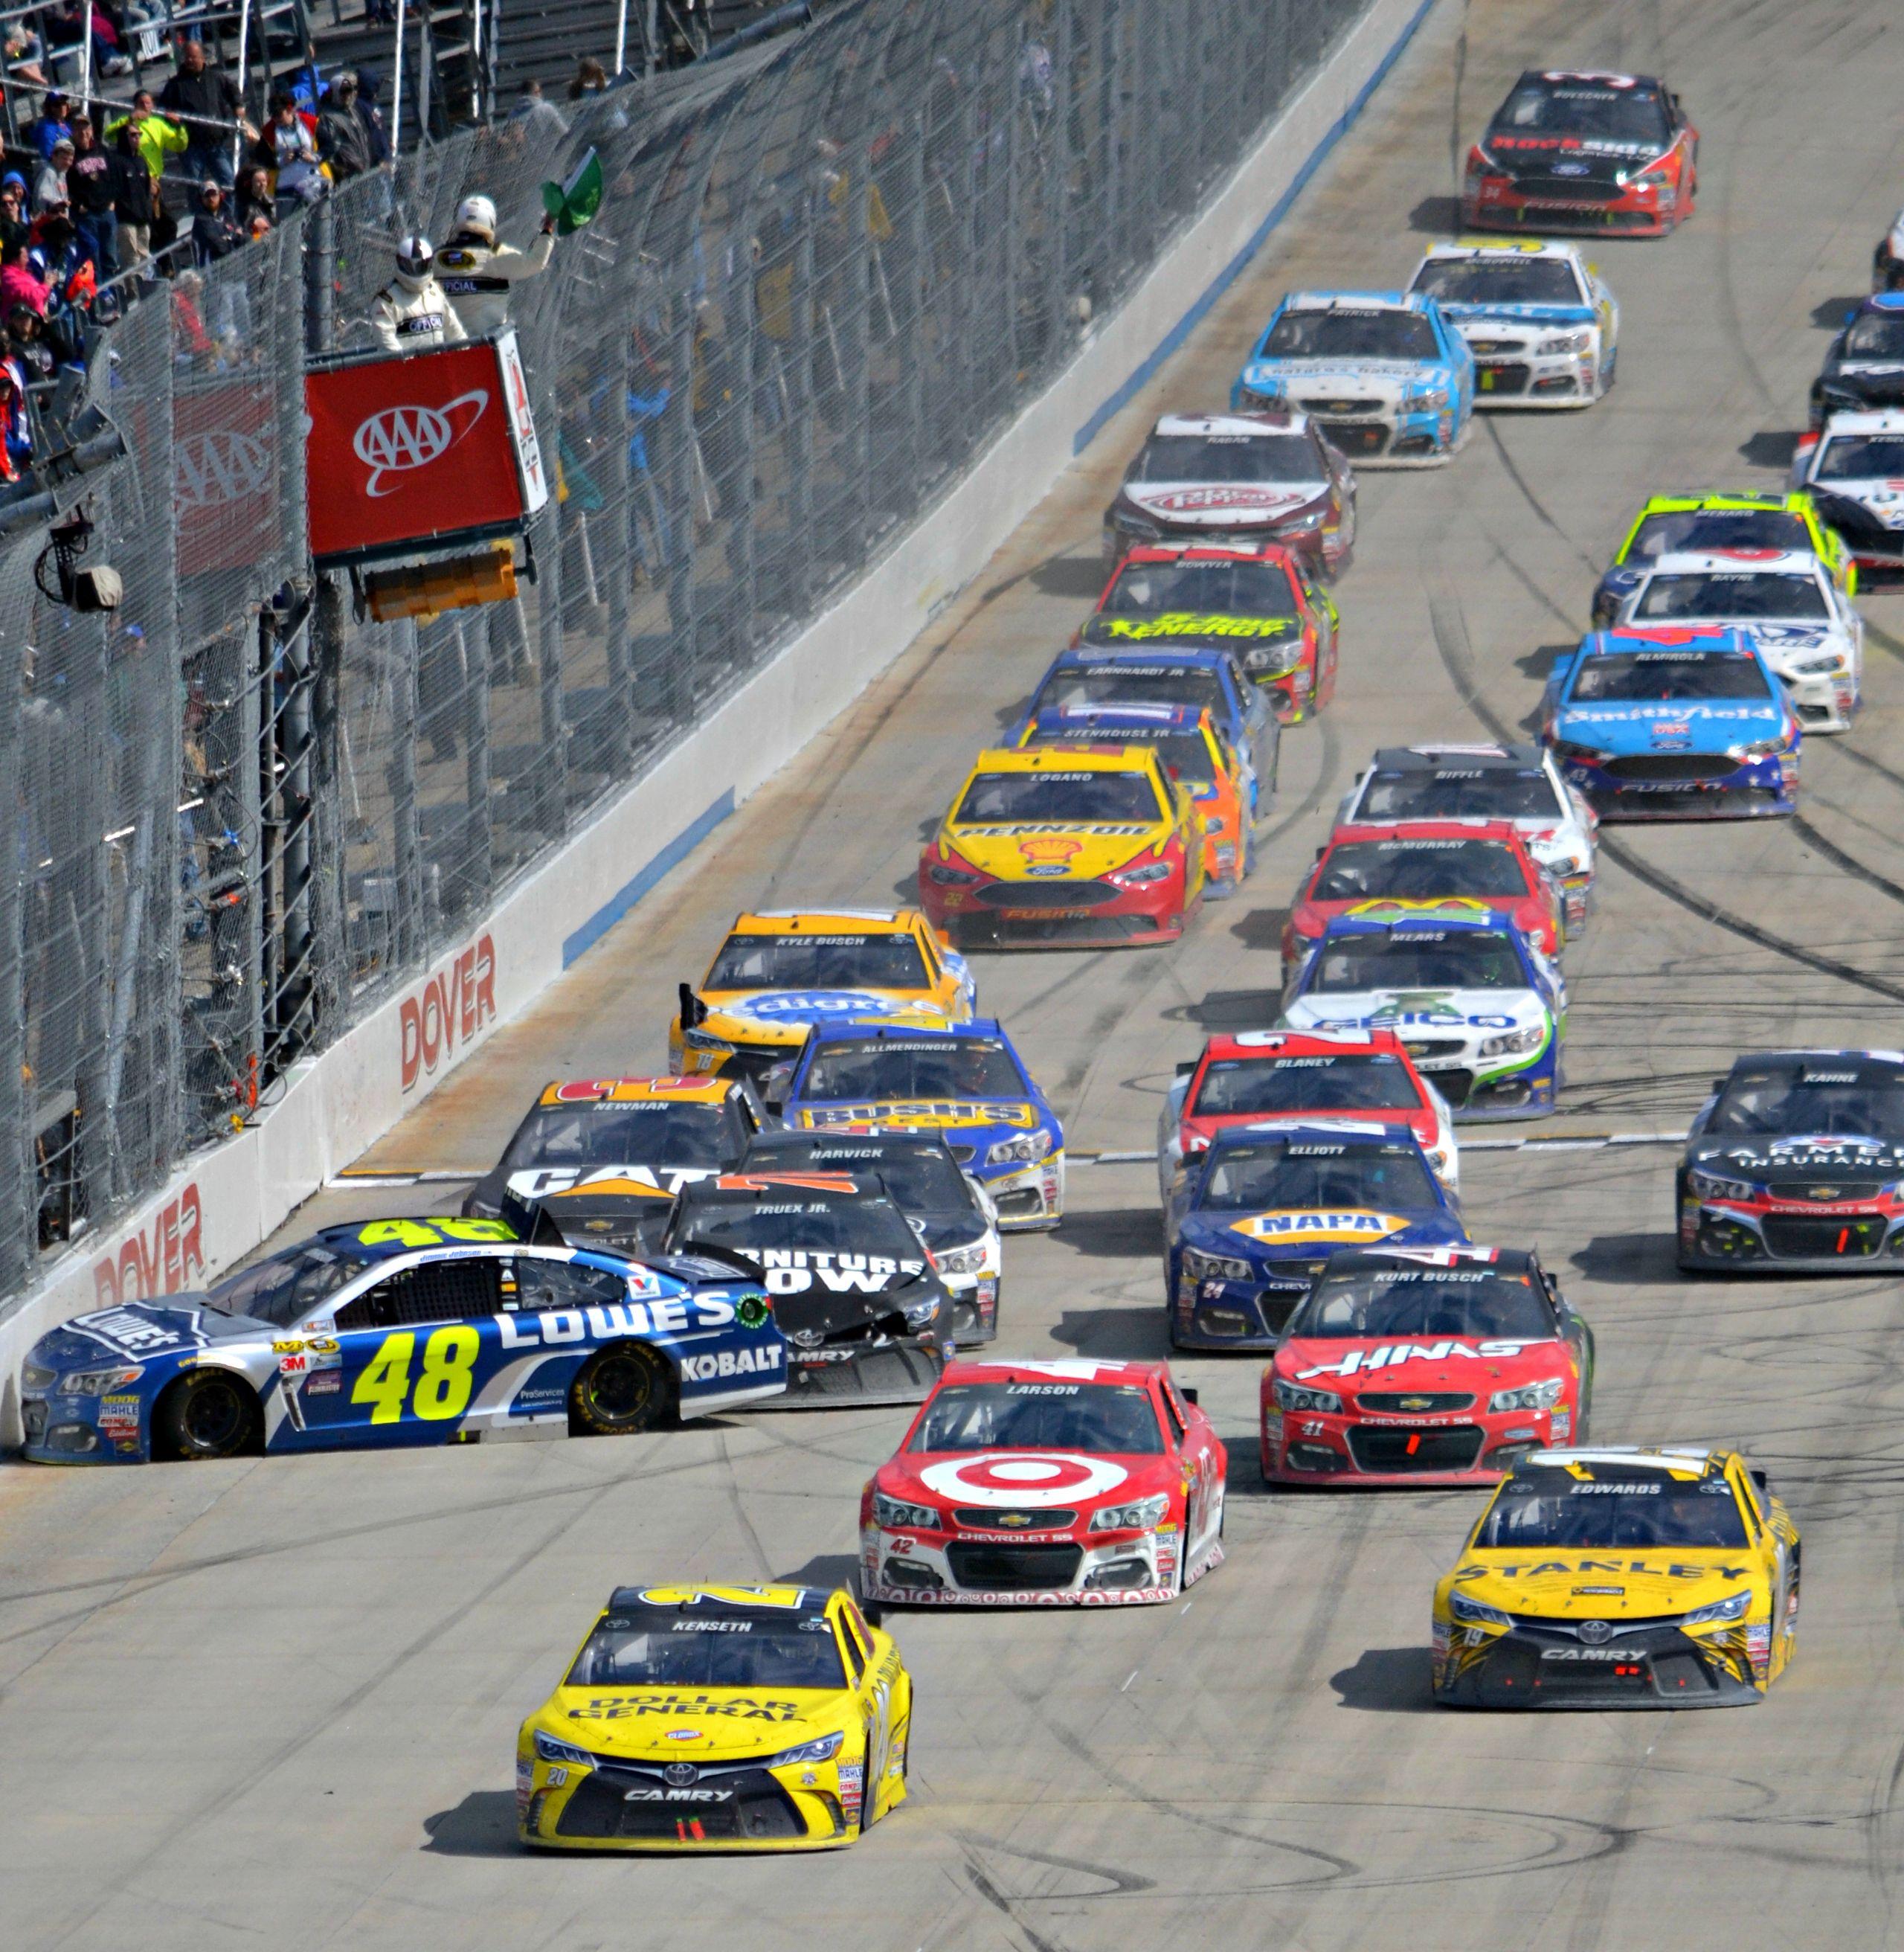 DOVER 18 CAR PILE UP START   NASCAR PICTS   Car, Nascar, Racing